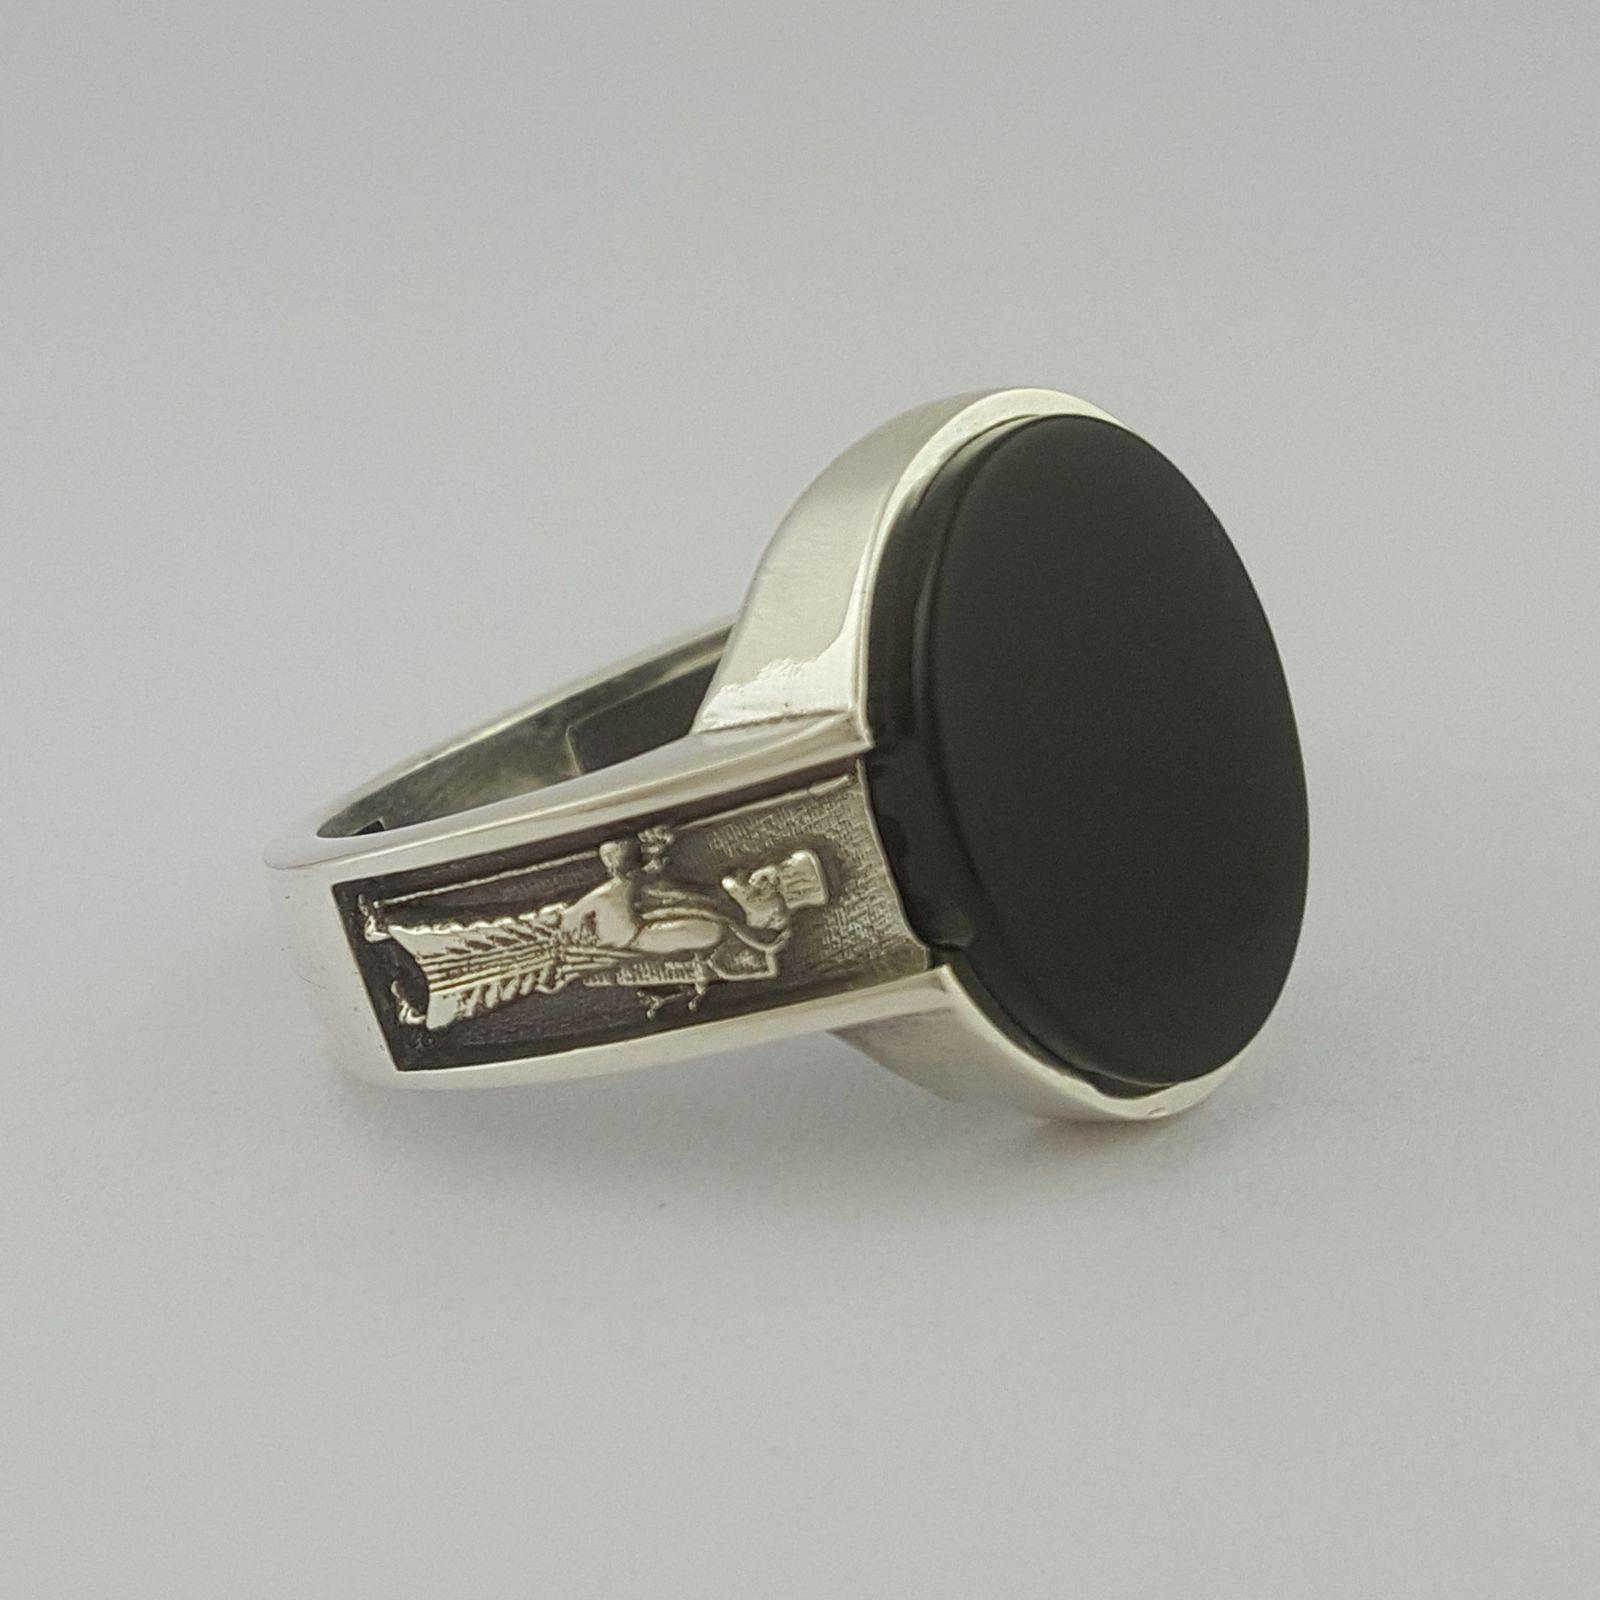 انگشتر نقره مردانه بلو استون کد 1069-63 -  - 3